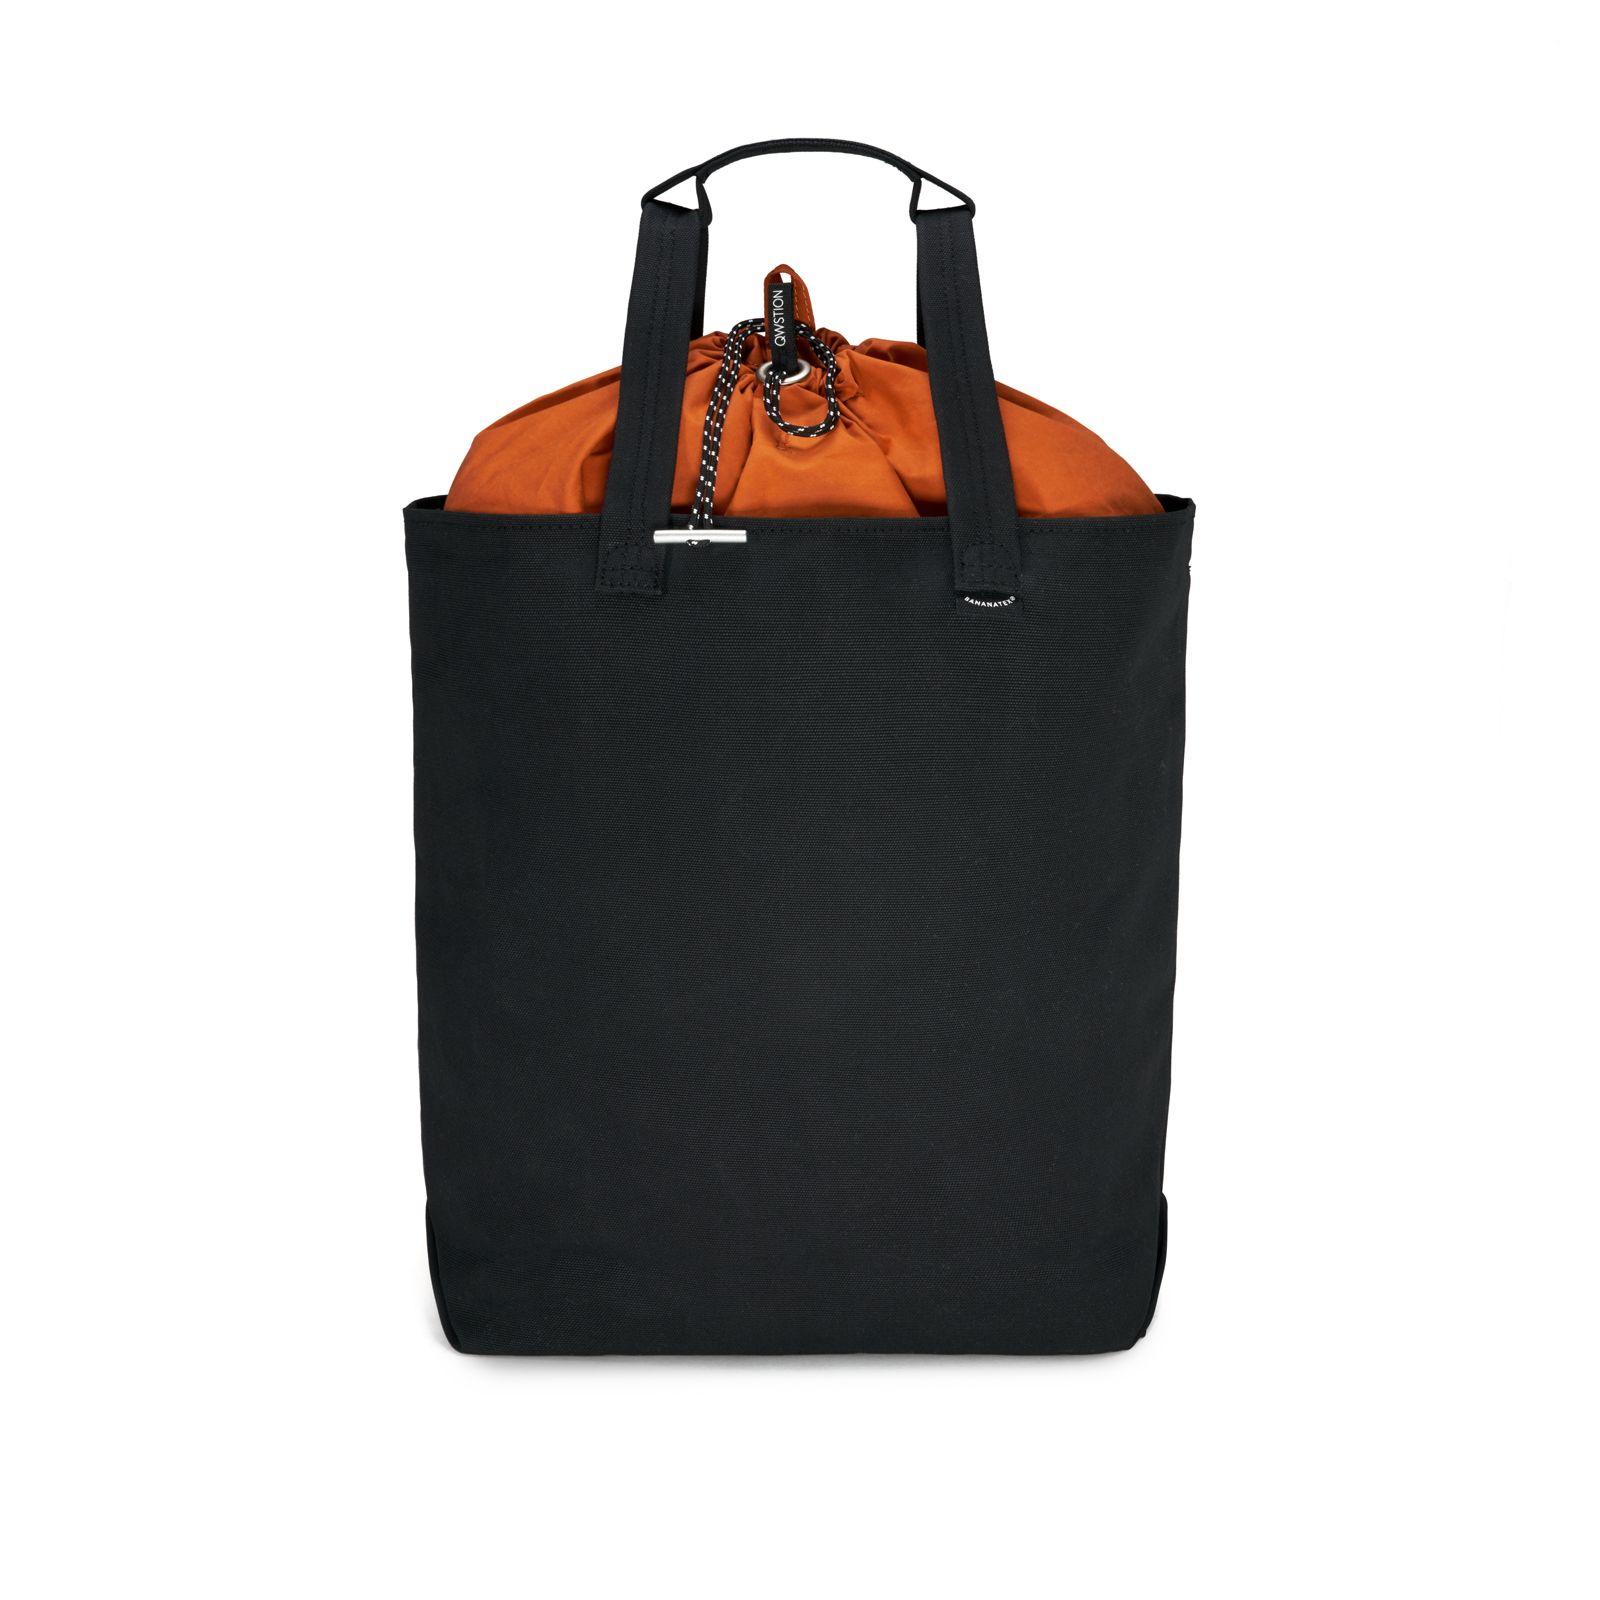 Bananatex® Tote Bag Medium - All Black Robin